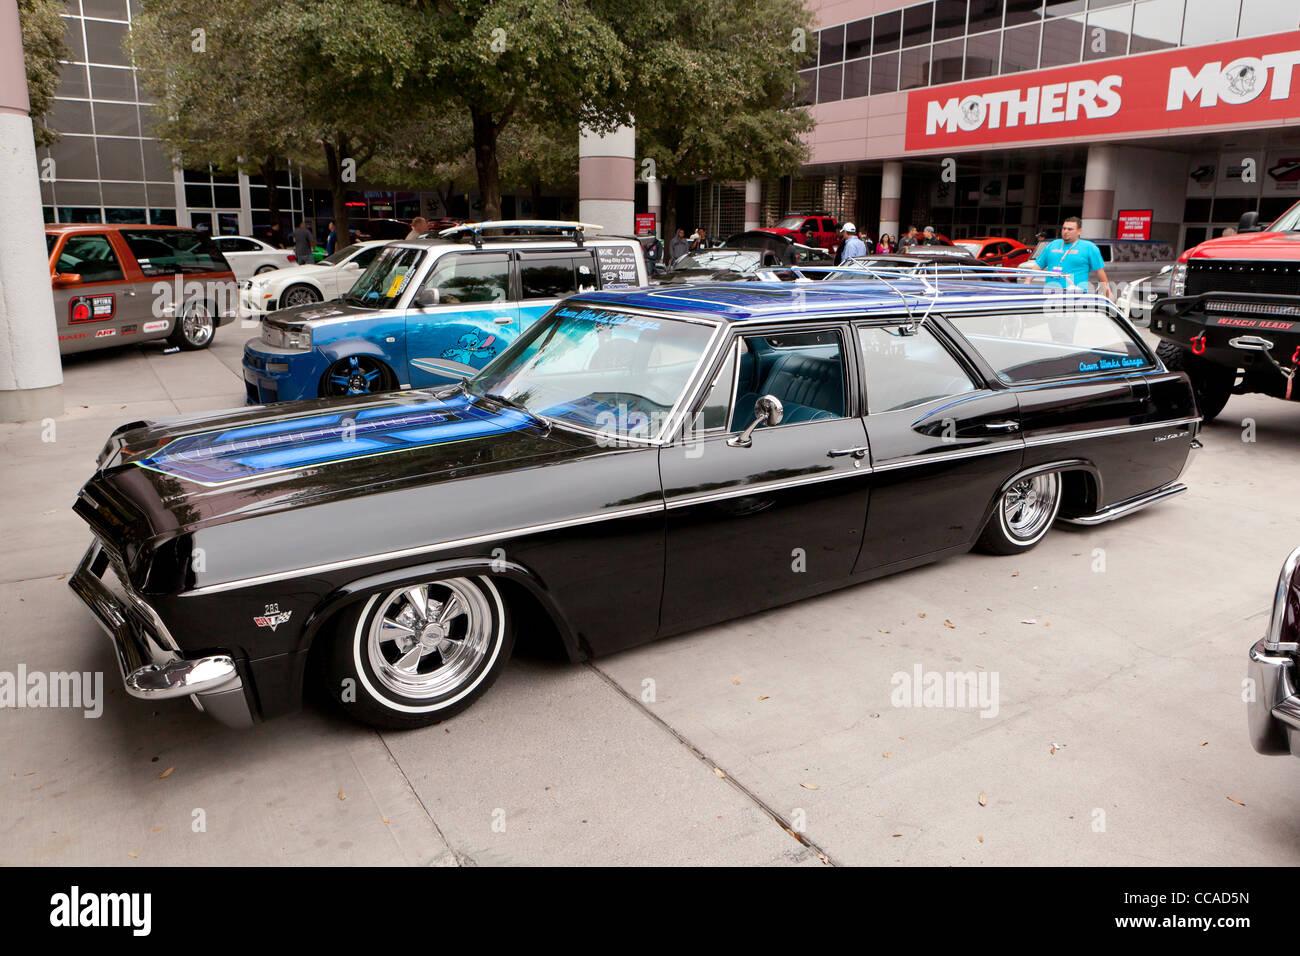 1965 Chevrolet Impala Station Wagon1975 1966 Chevy Caprice Wagon 1968 Bel Air Low Rider Stock Photo